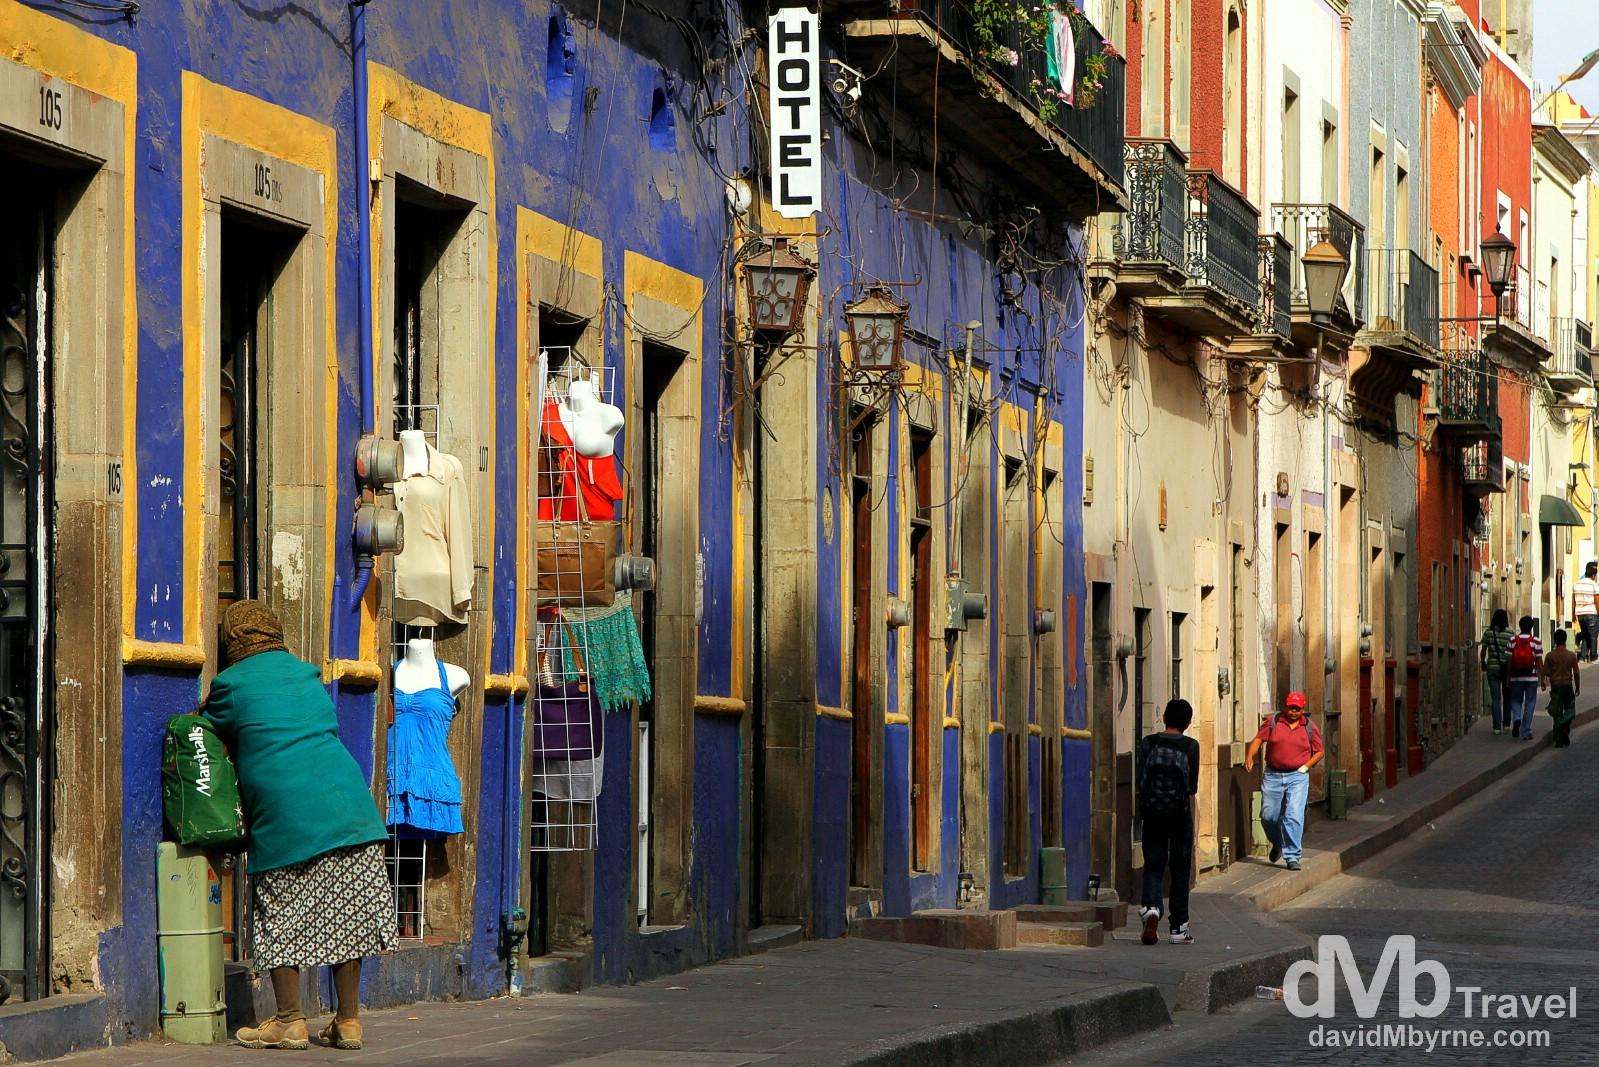 Buildings along Picitos, Guanajuato, Mexico. April 23rd 2013.